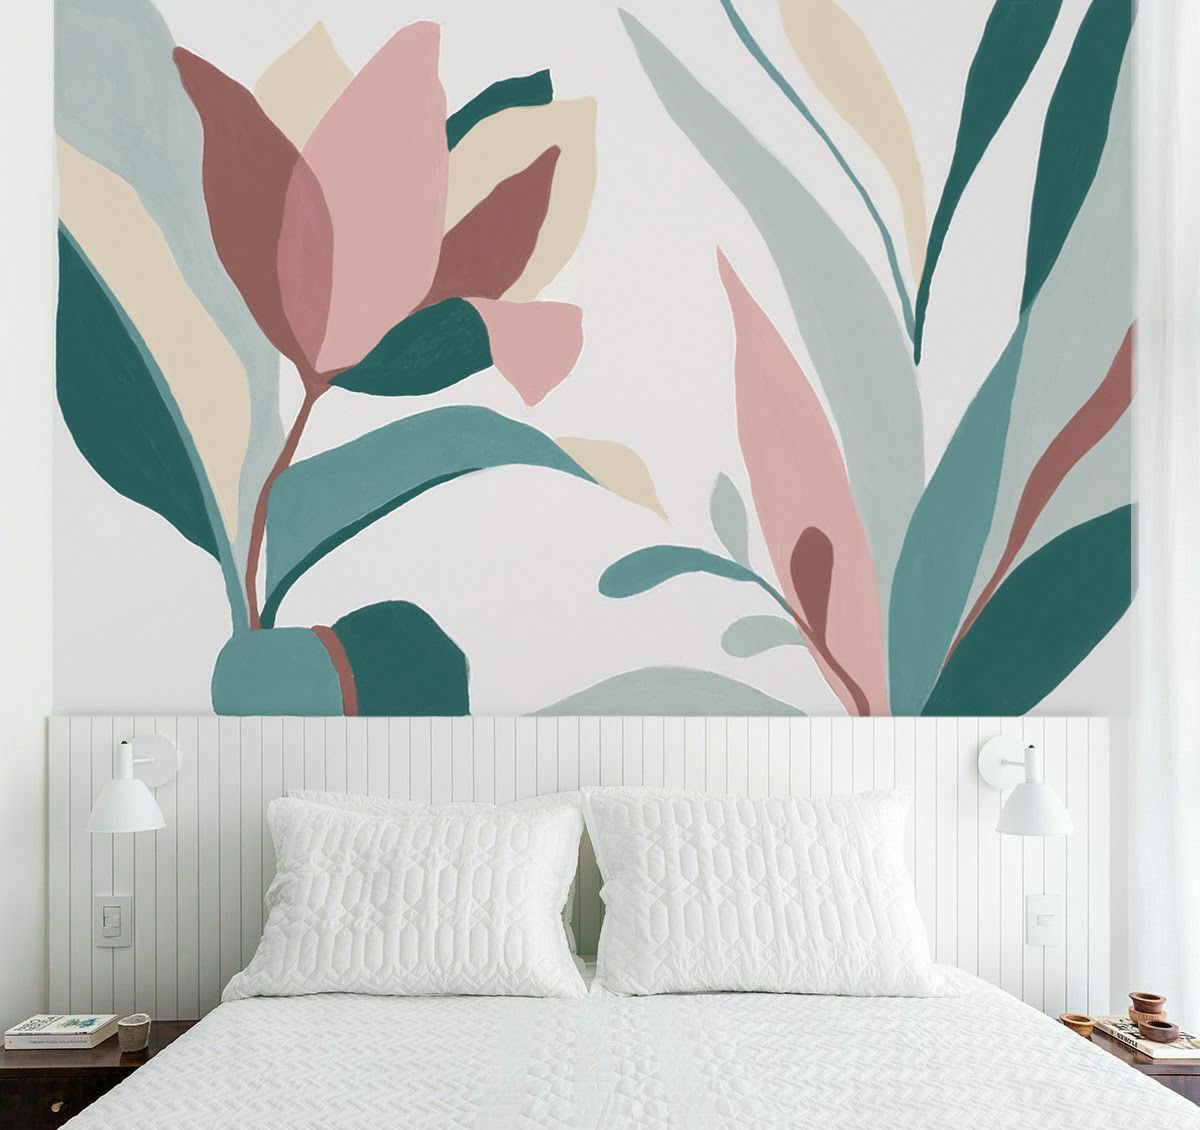 Projeto pintura em quarto casal